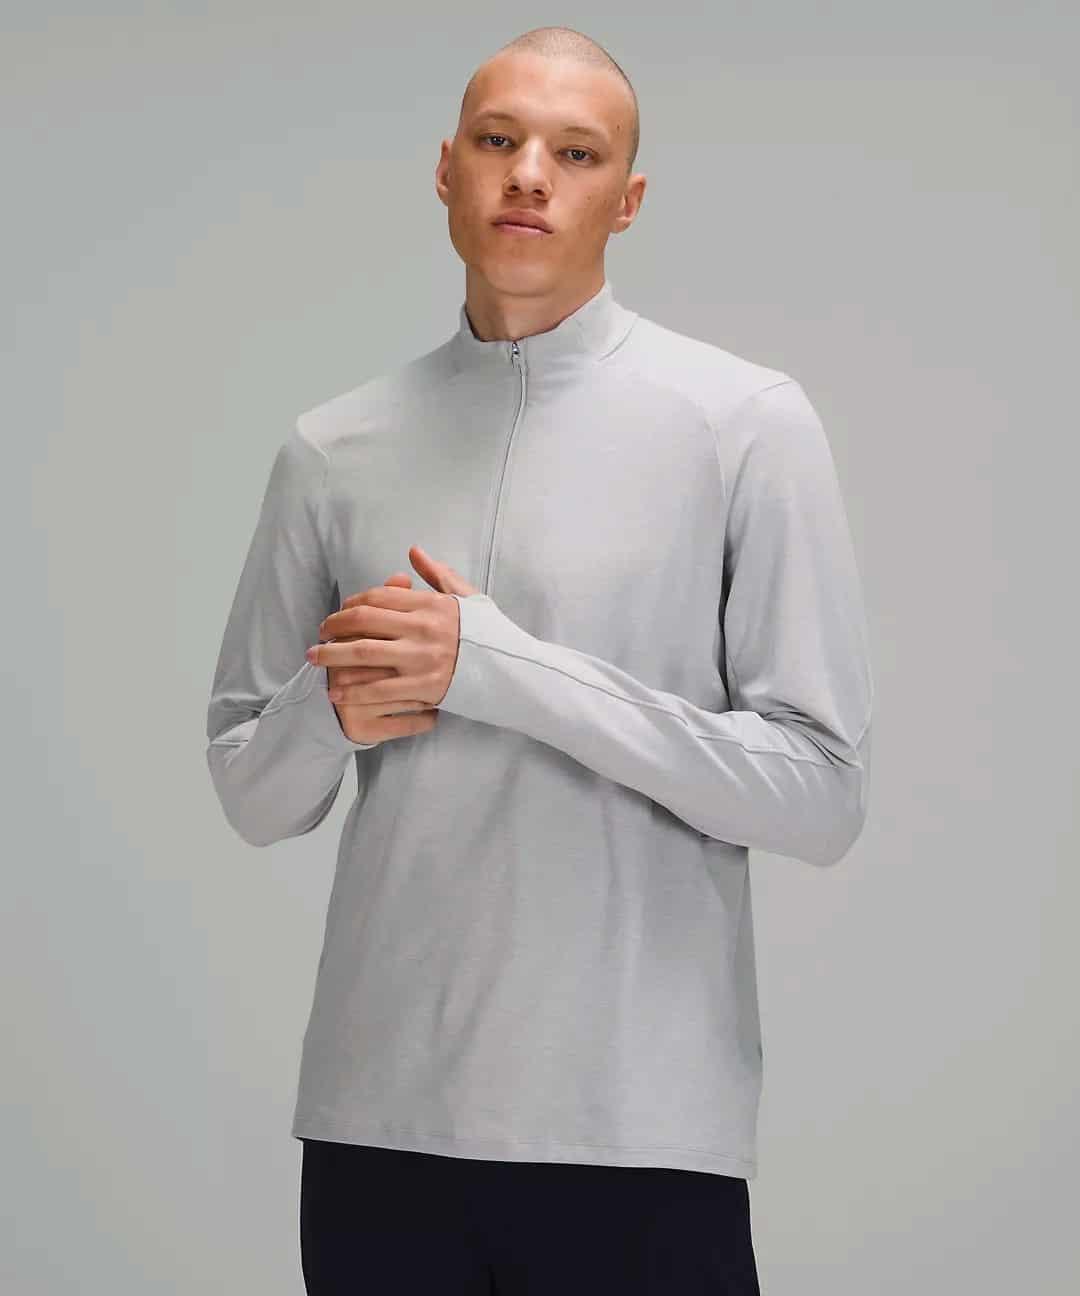 Surge Warm 1/2 Zip | Men's Long Sleeve Tops | lululemon